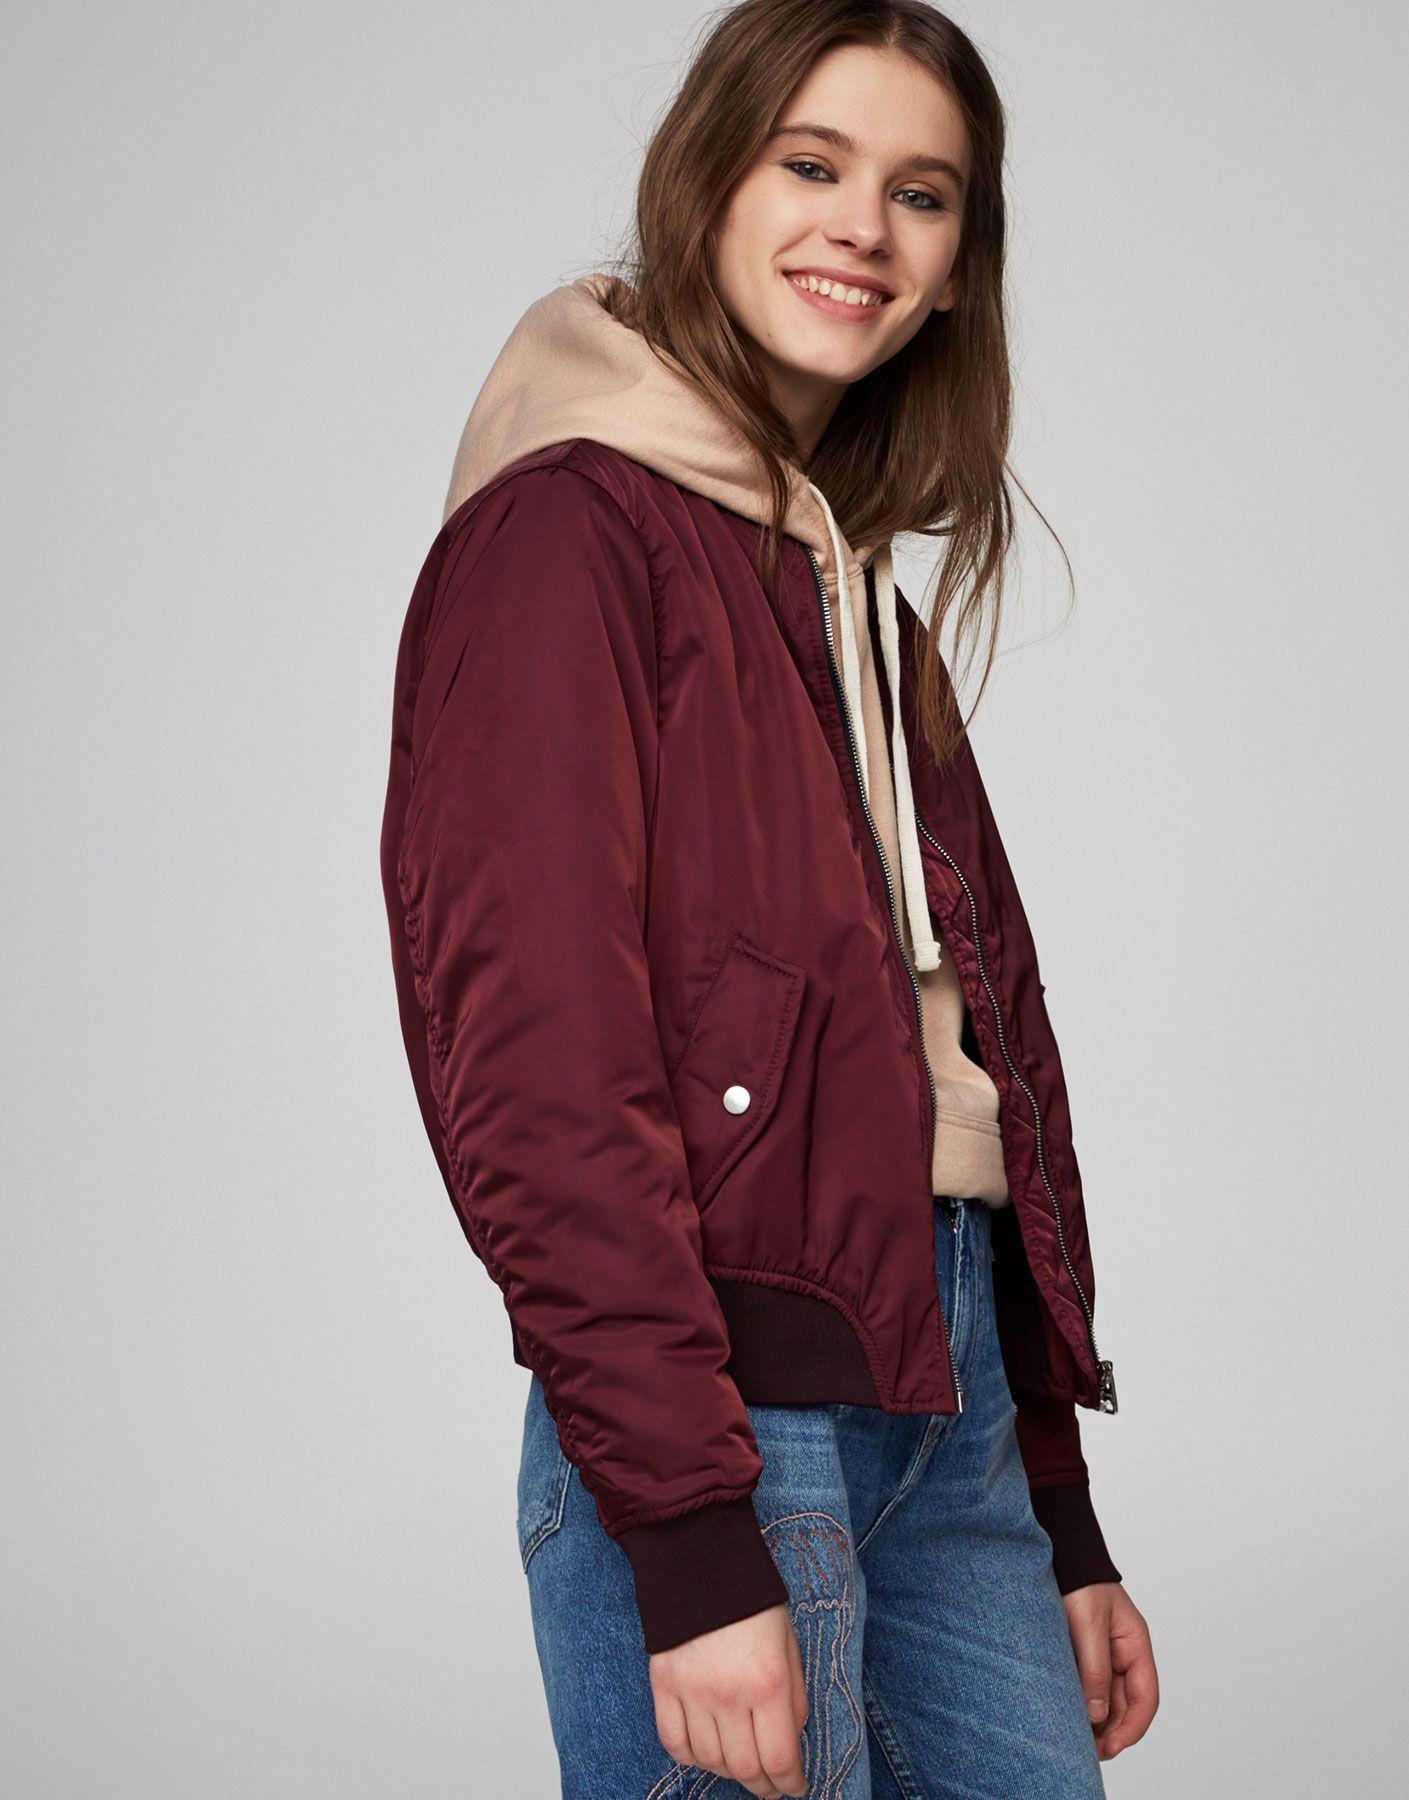 Bomber jacket Bomber jacket, Jackets, Spring outerwear